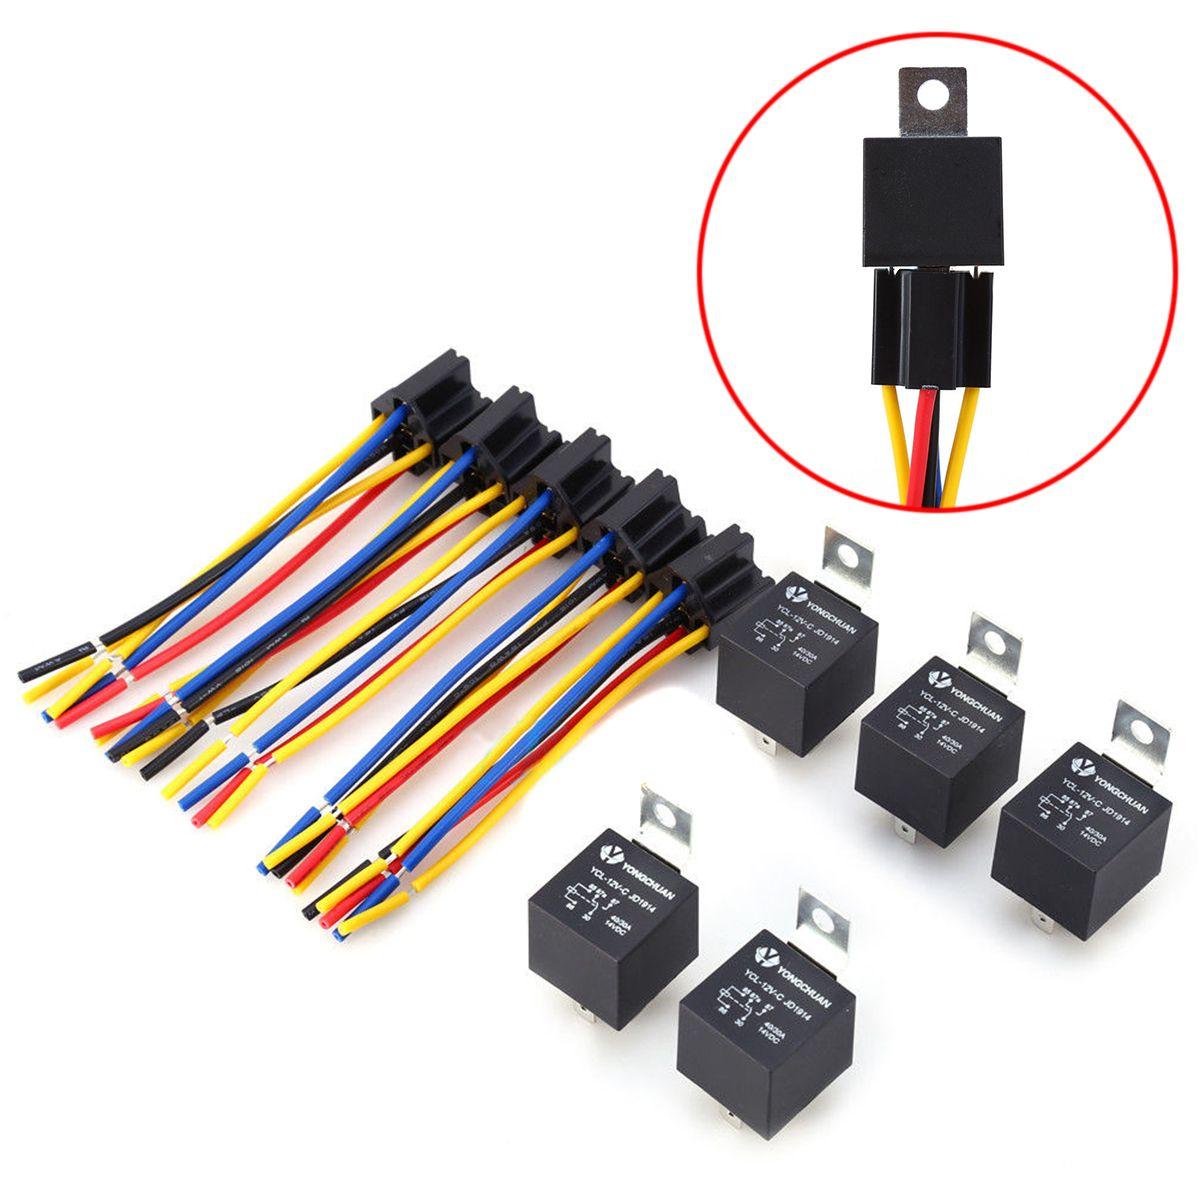 Fantastic 2019 Dc 12V 40A Amp Relay Socket Spdt 5 Pin 5 Wire Ycl 12V C Wiring 101 Mentrastrewellnesstrialsorg